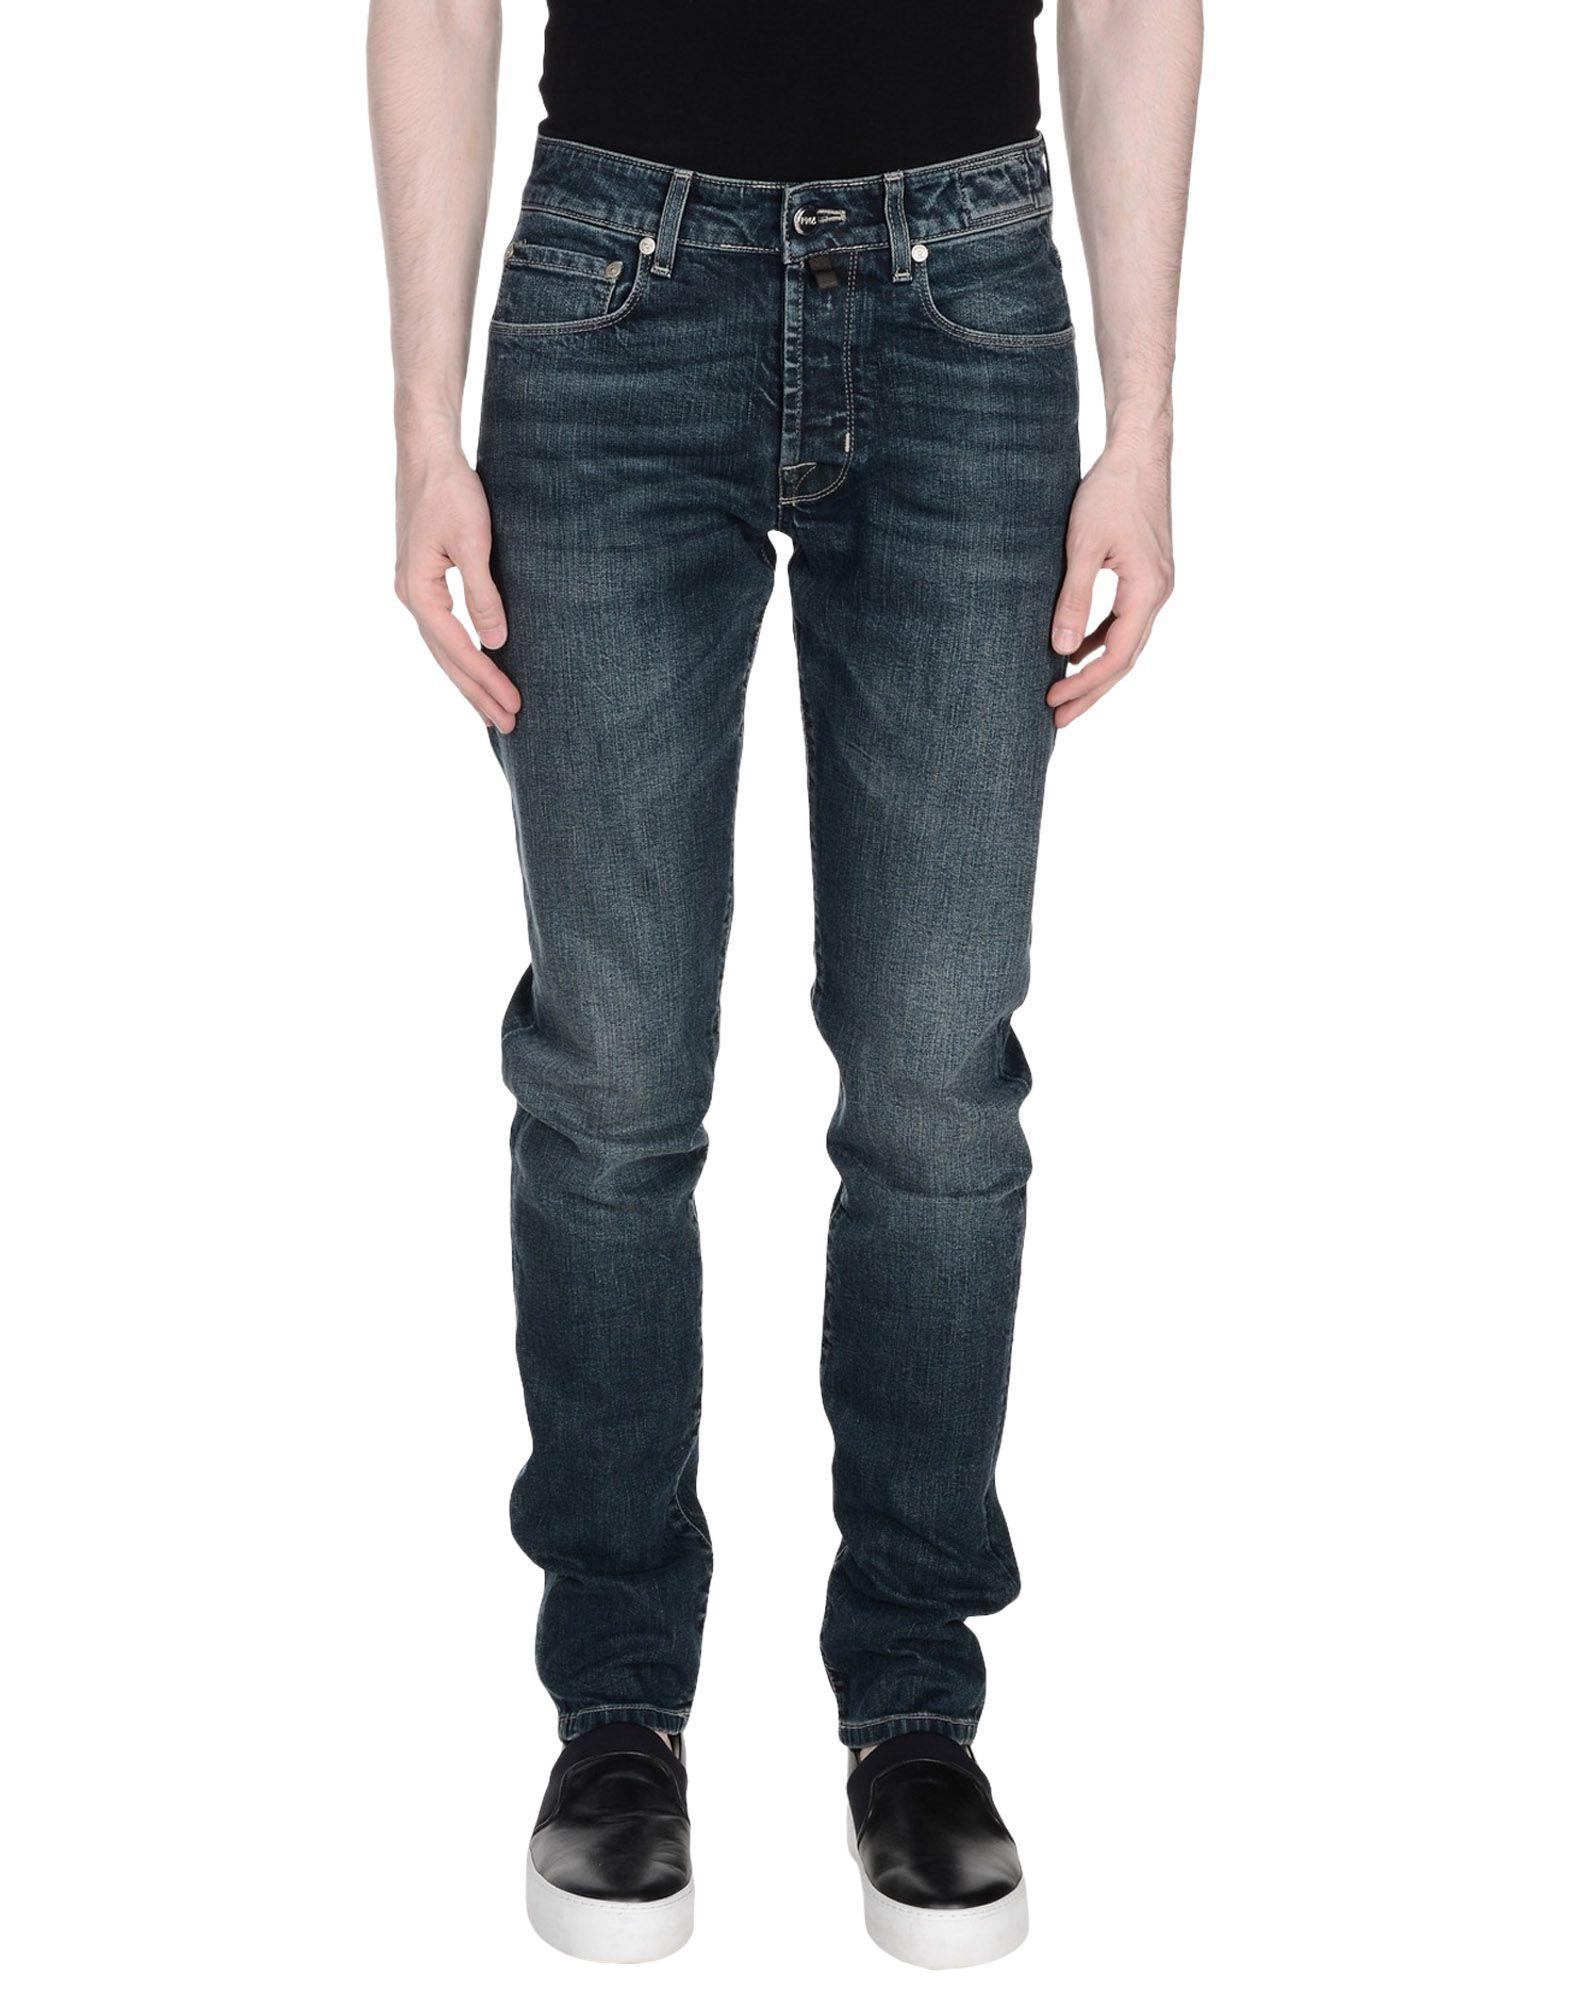 Pantaloni Jeans Pt05 Donna - Acquista online su